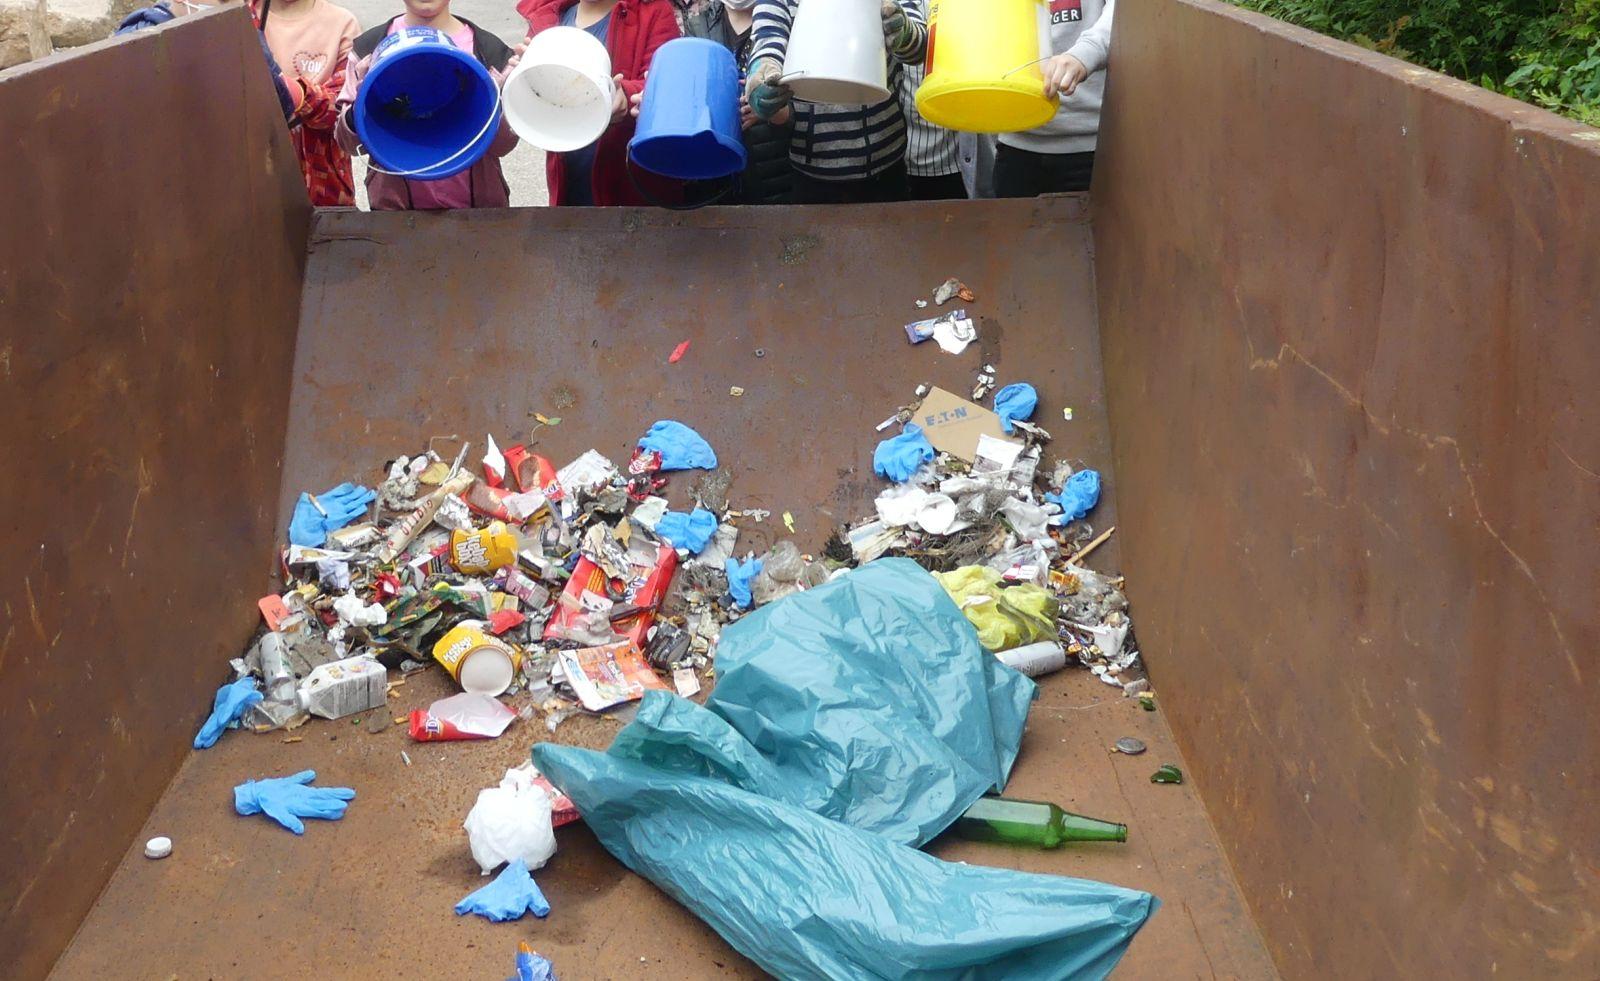 Müllsammelaktion der Berneckschule. Foto: him